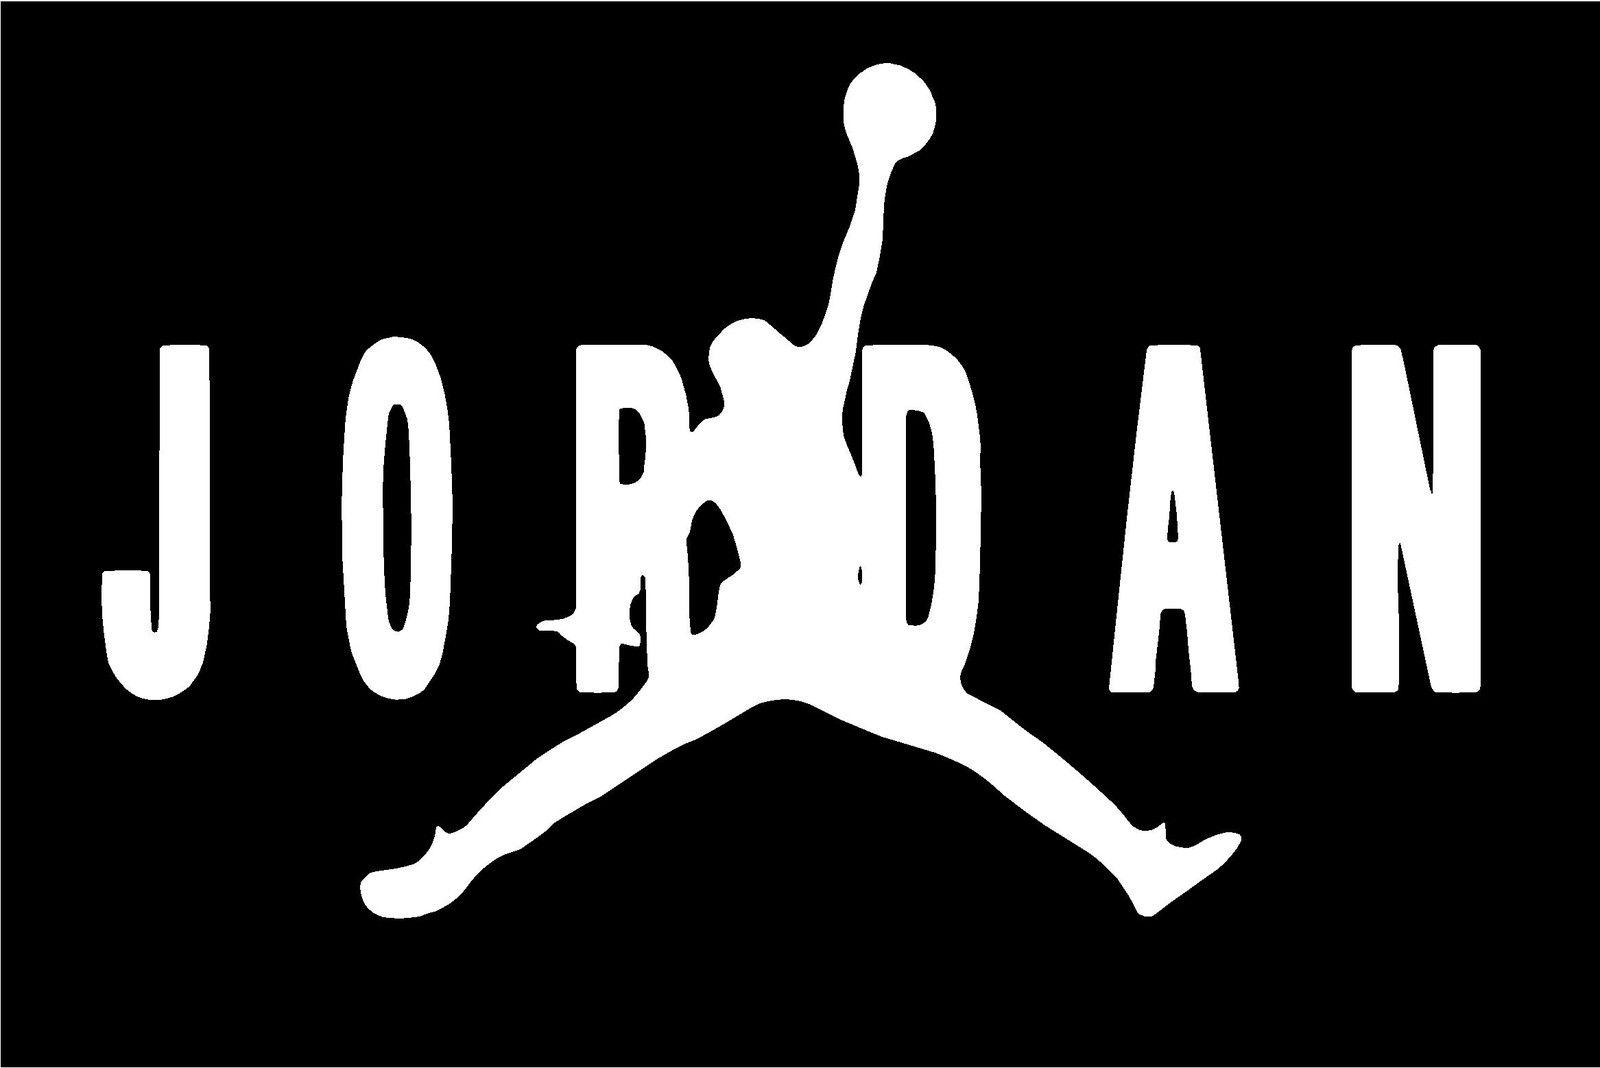 Michael Jordan Flight Logo Wallpaper 1600x1068